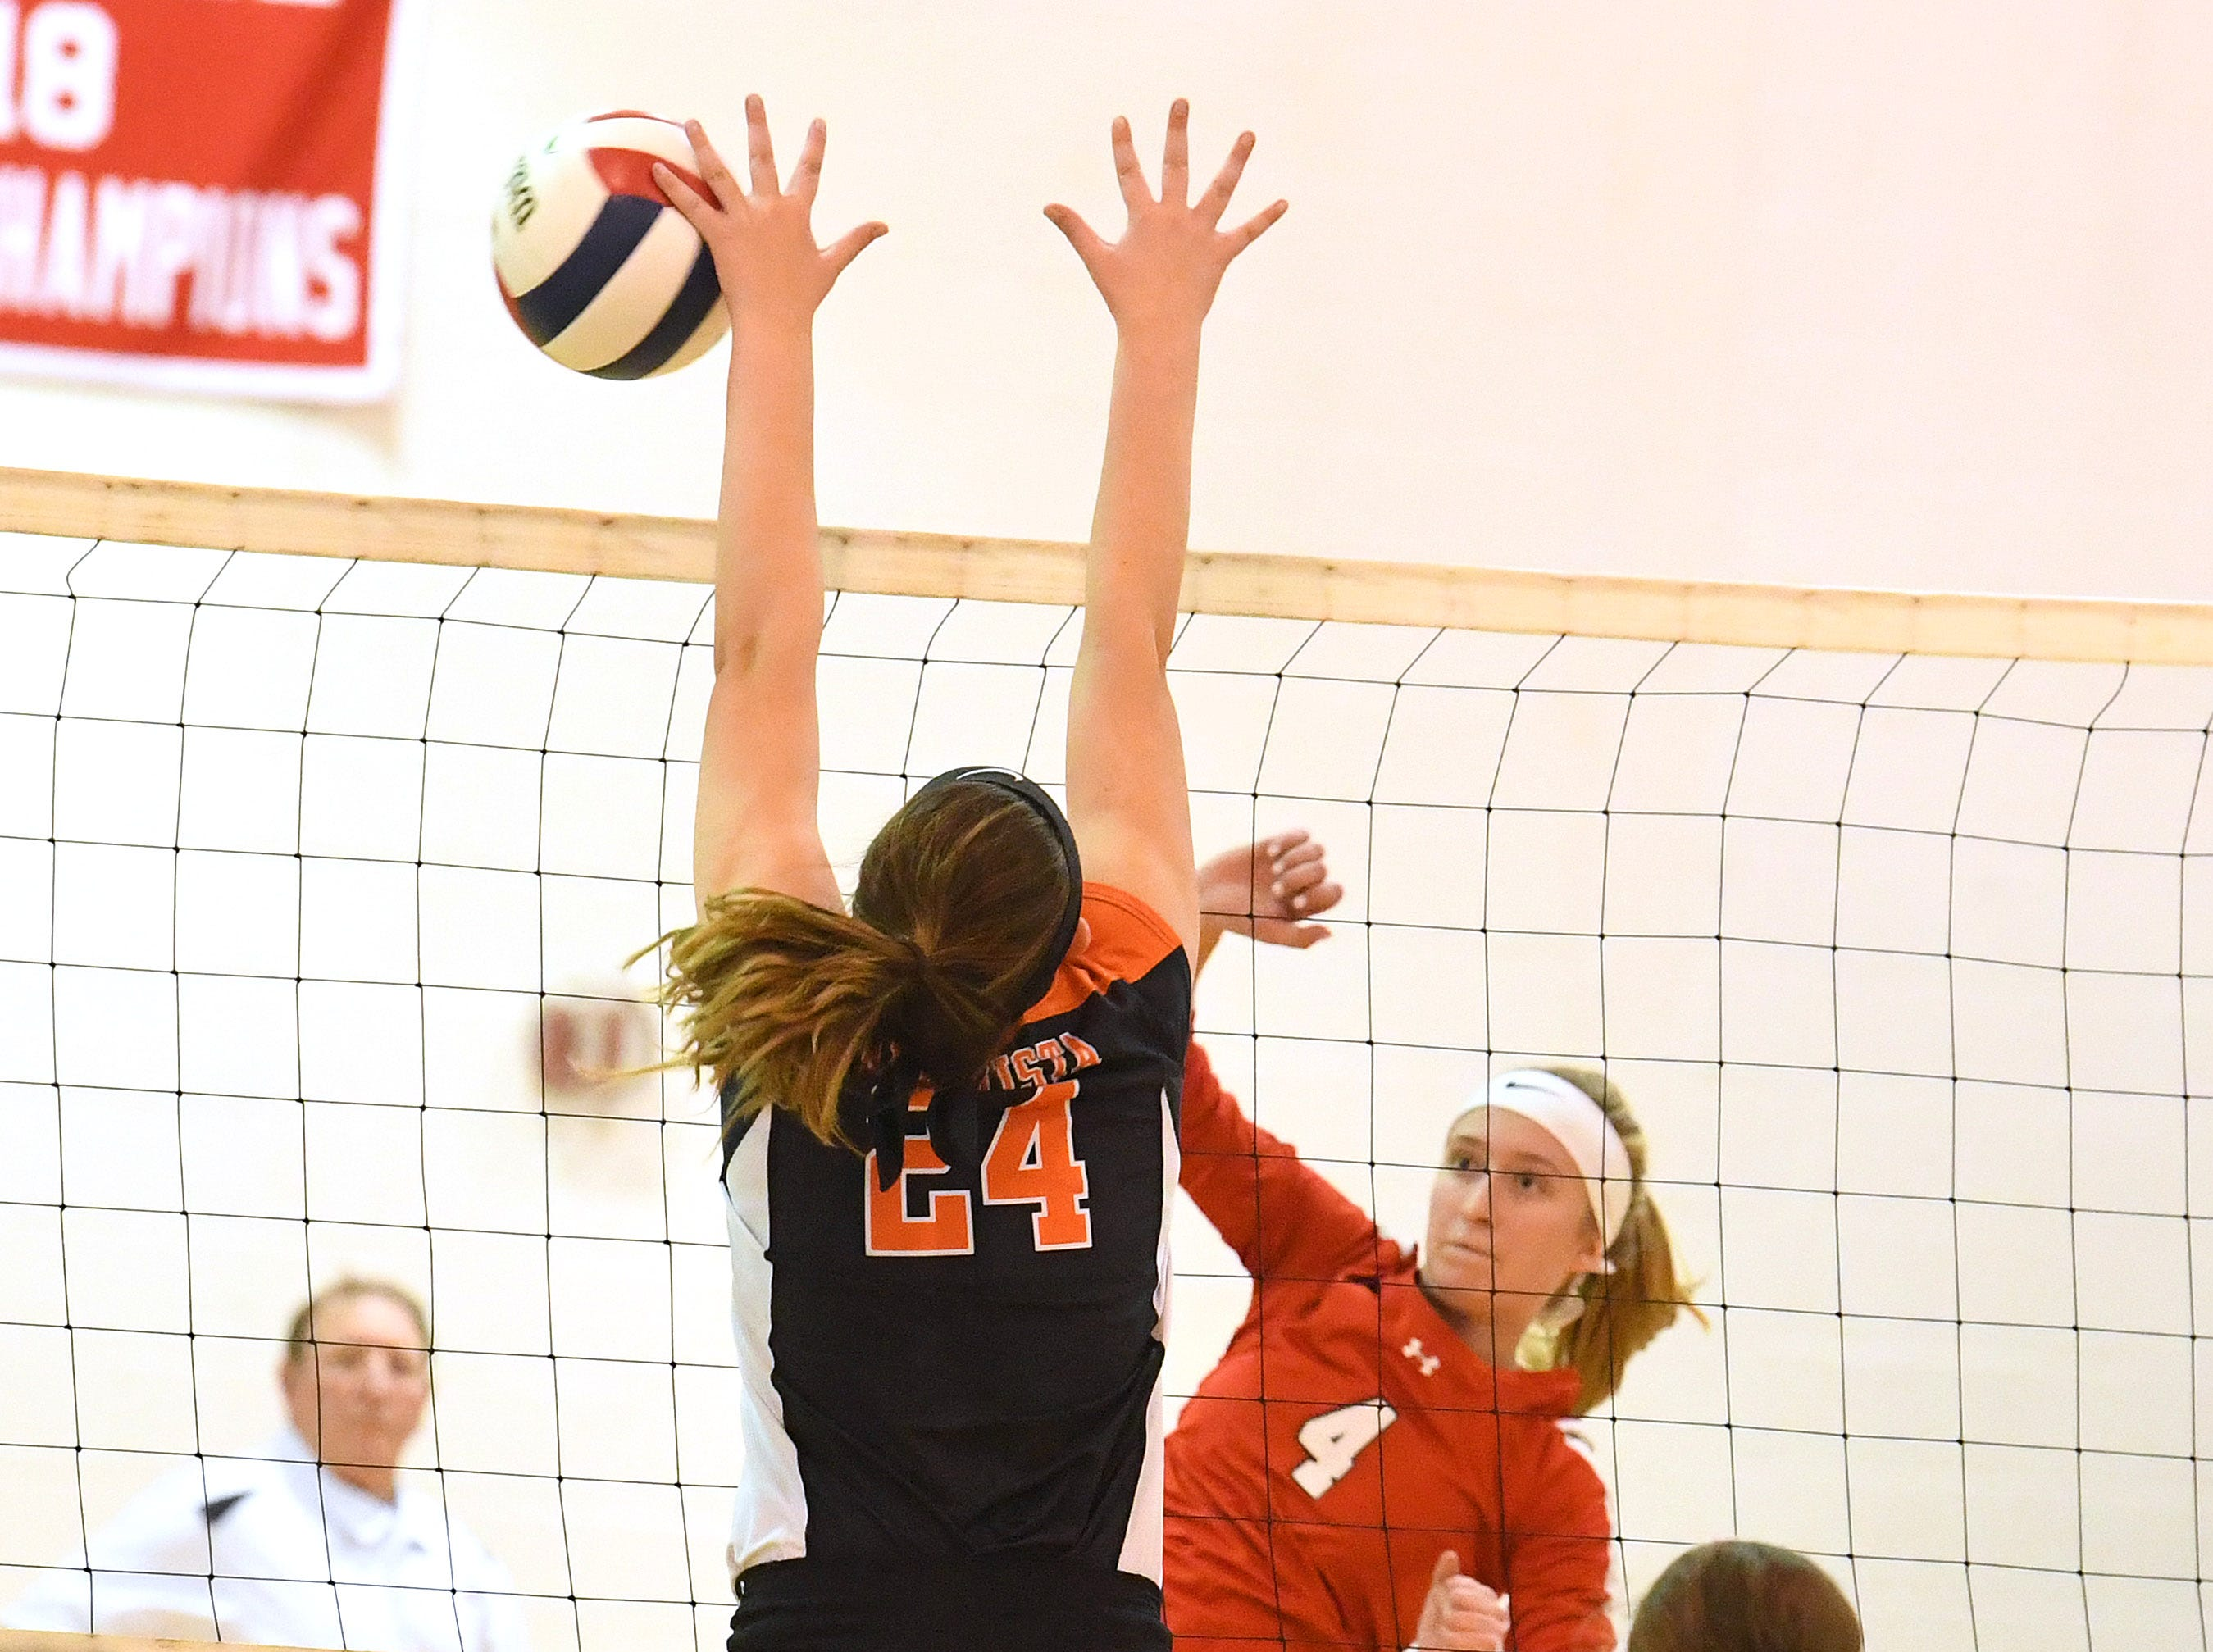 Rivrheads Emma Tomlinson sends the ball across the net past Altavista's Rachel Branning during the Region 1B volleyball championship played in Greenville on Wednesday, Nov. 7, 2018.